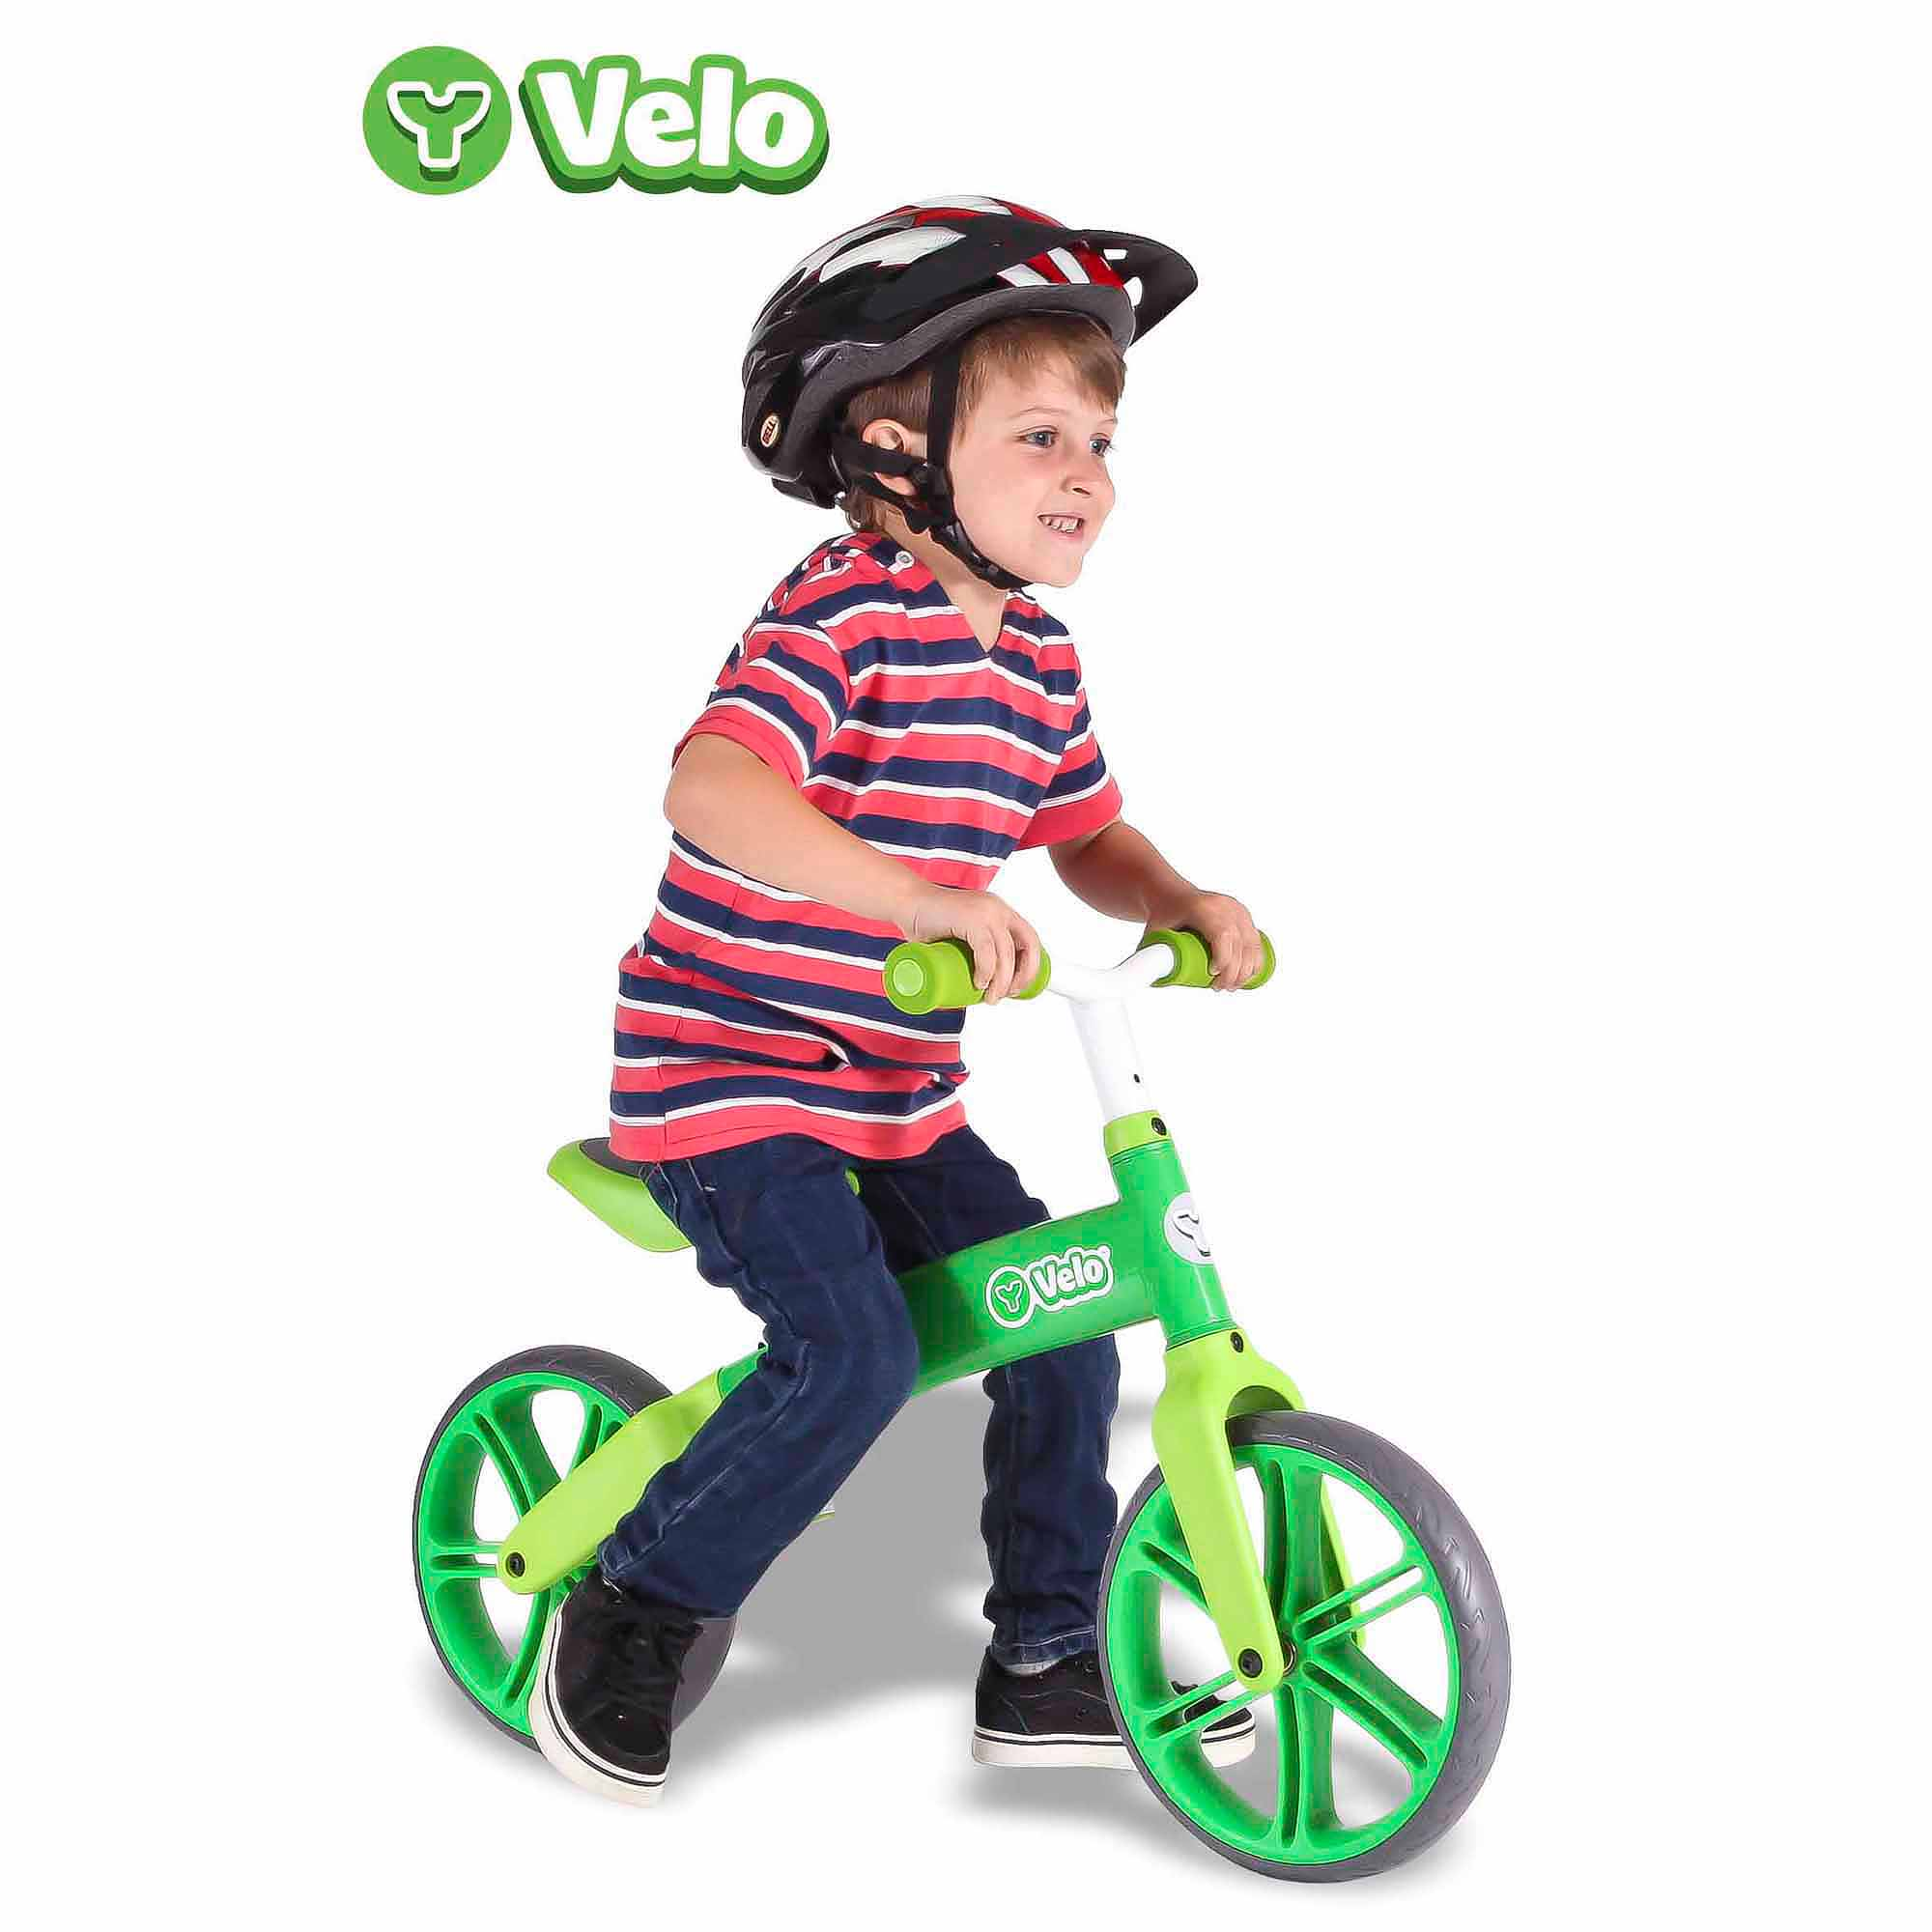 Yvolution Y Velo Balance Bike, Green